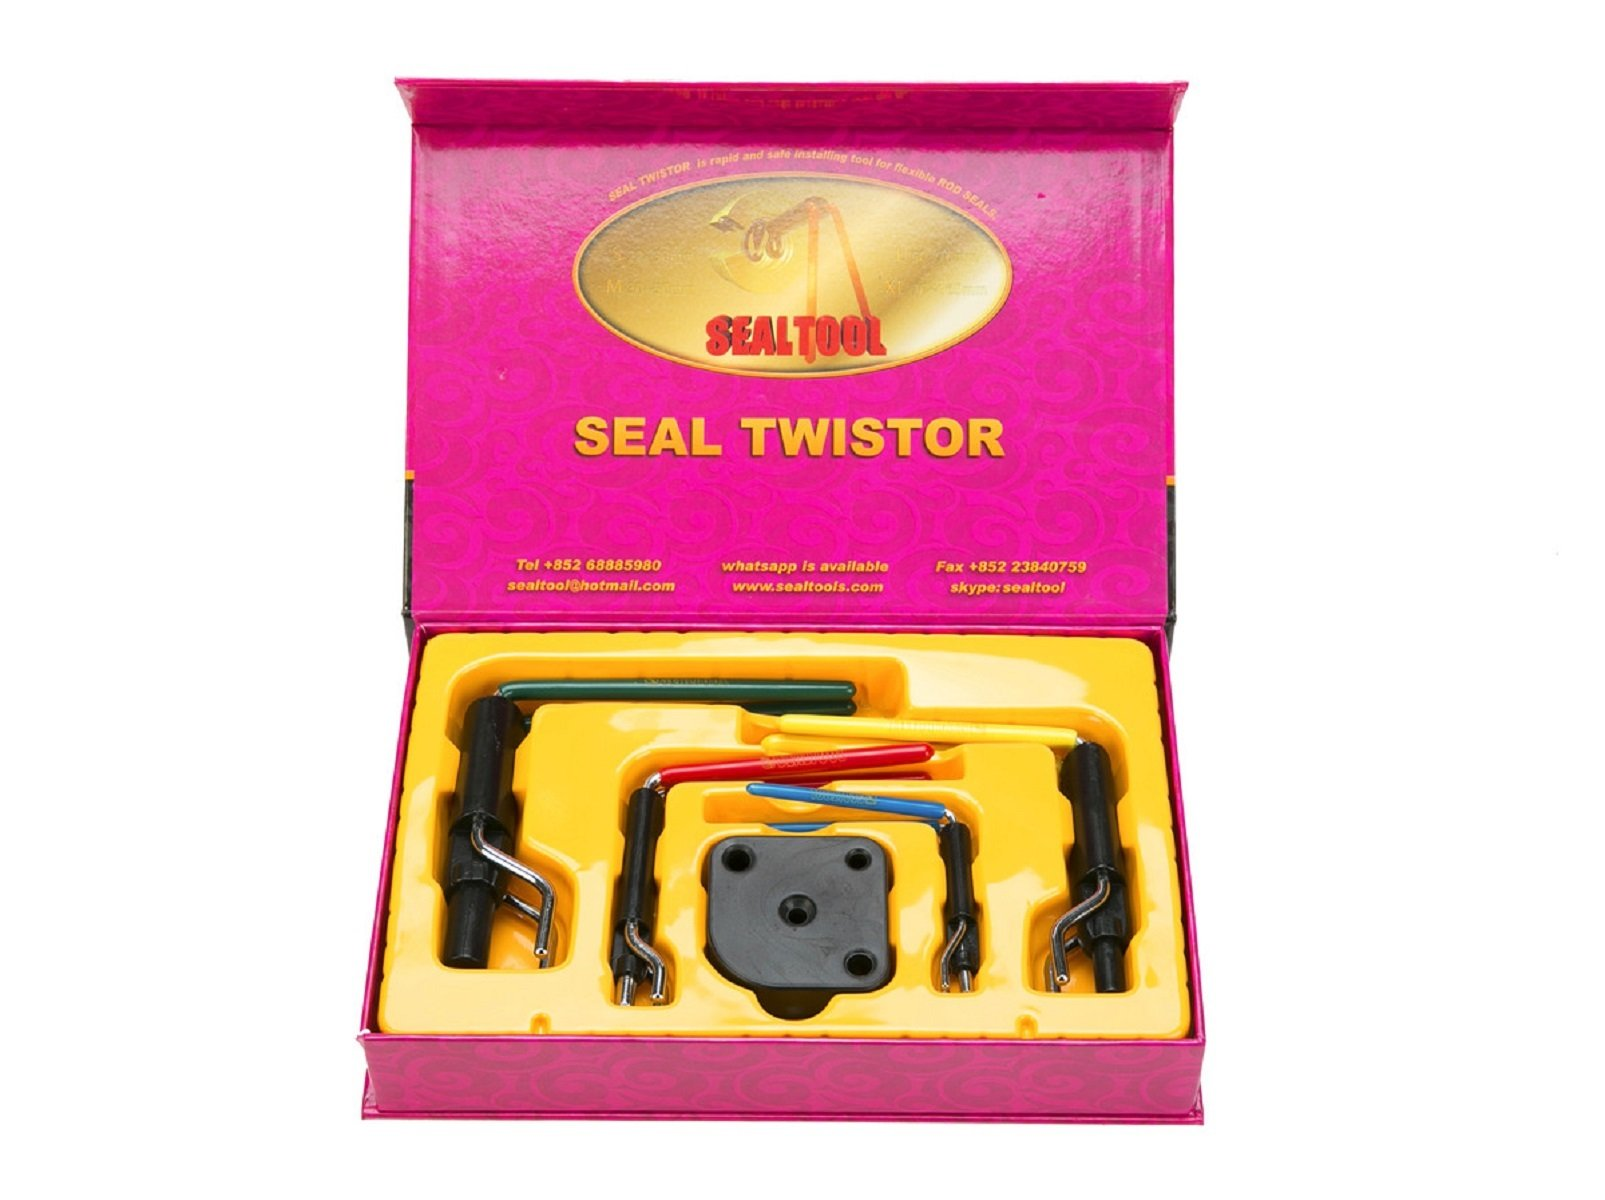 8milelake Hydraulic Cylinder Piston Rod Seal U-cup Installation Tool kit by 8MILELAKE